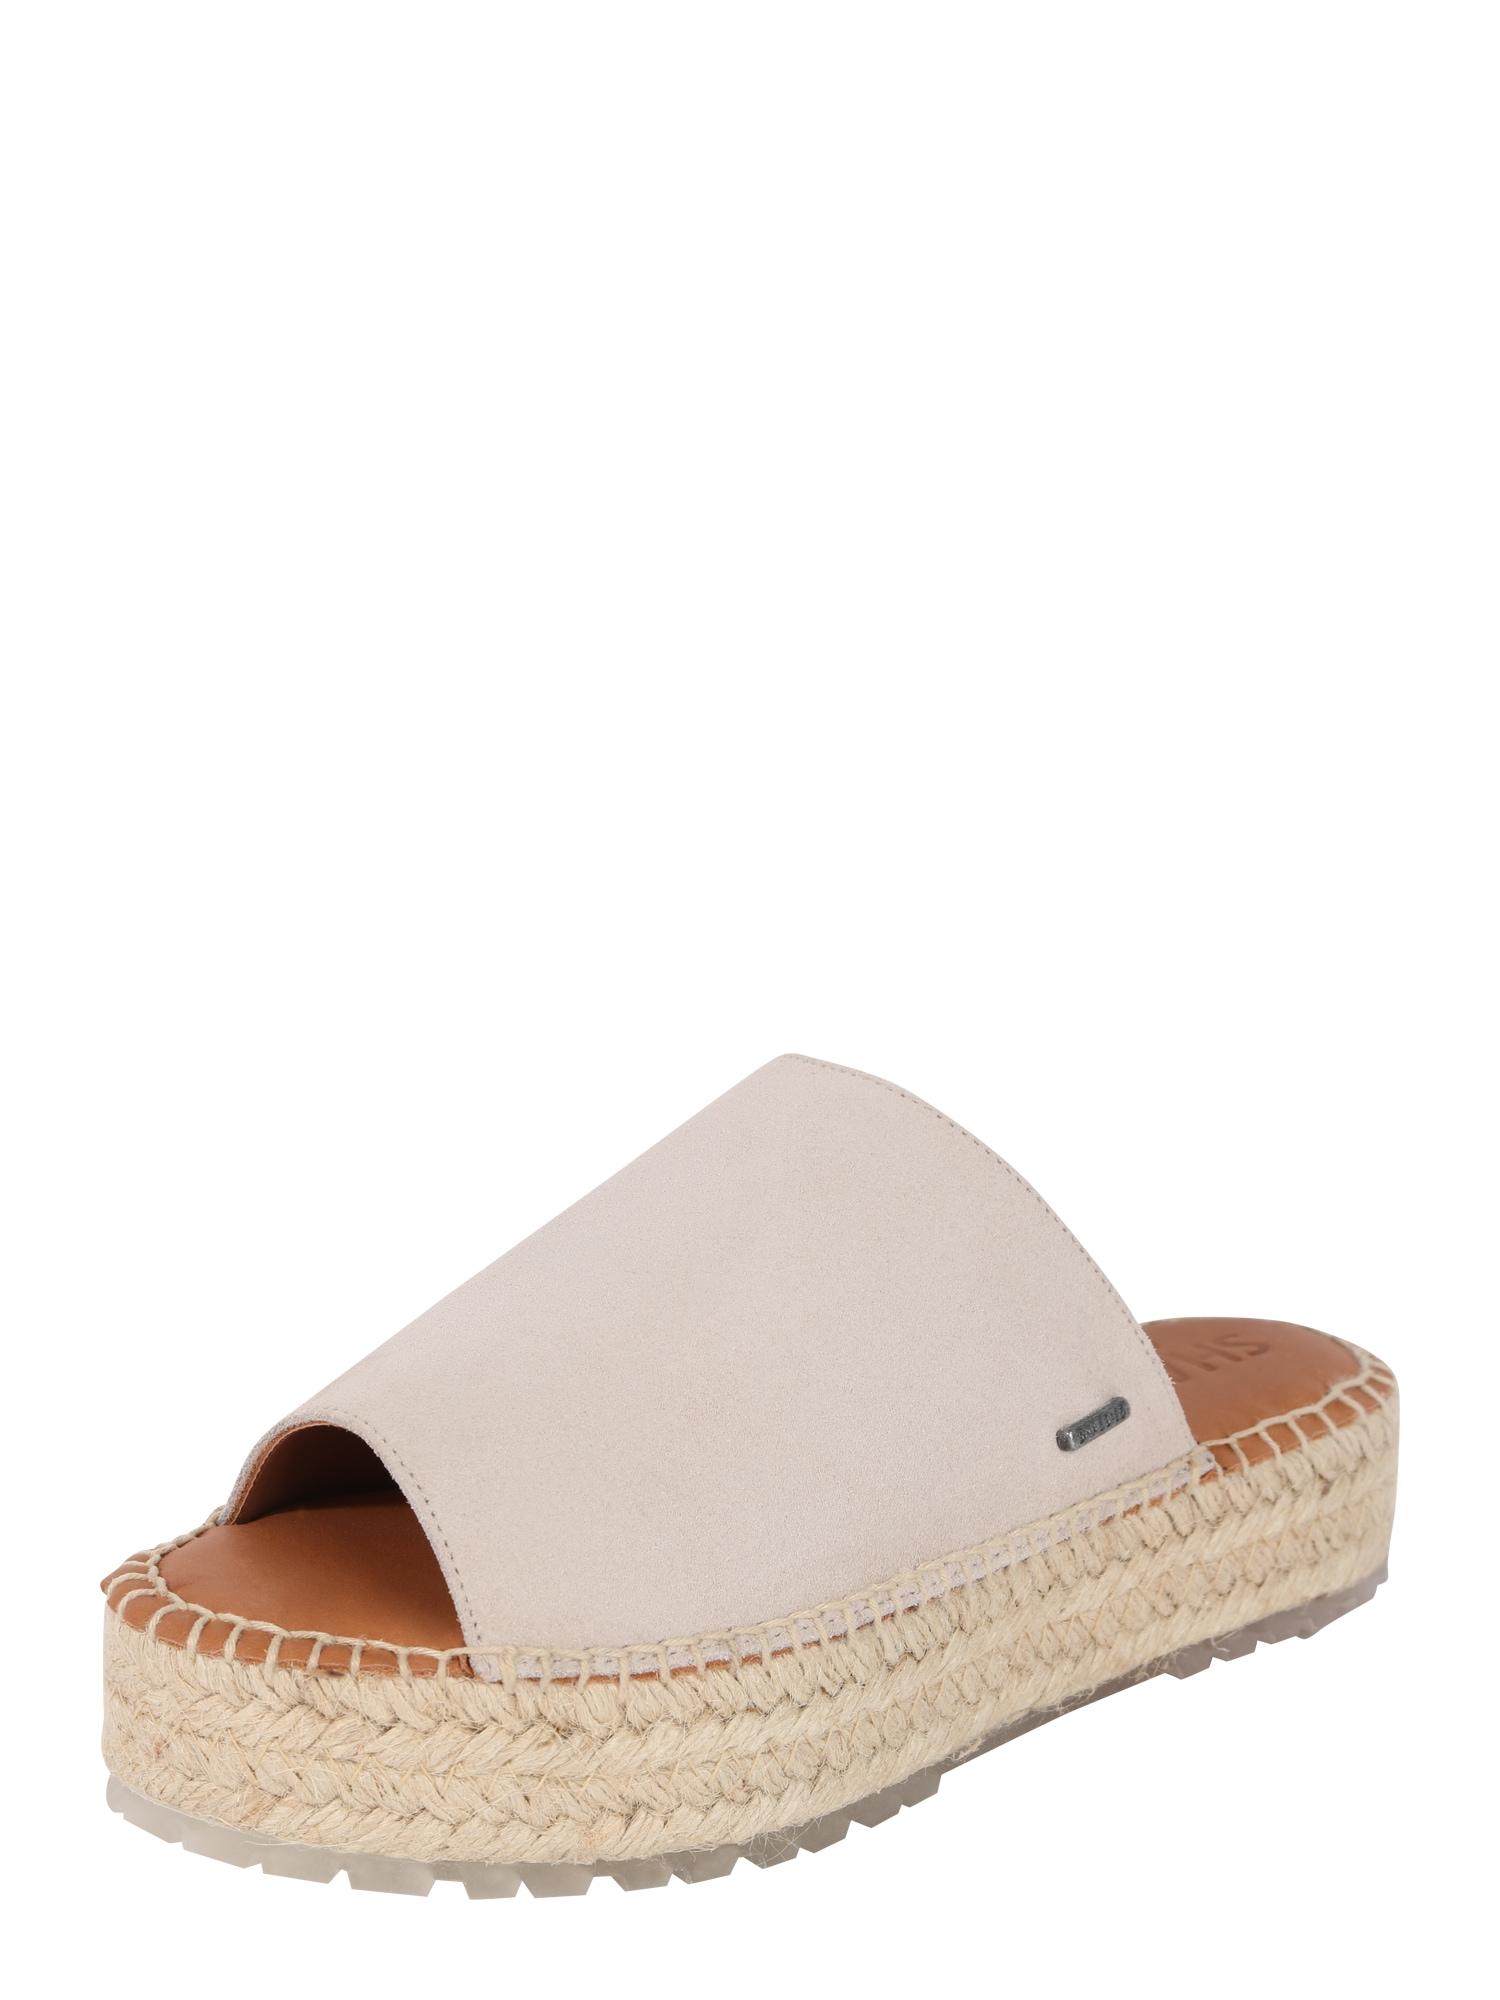 Pantofle béžová SHABBIES AMSTERDAM